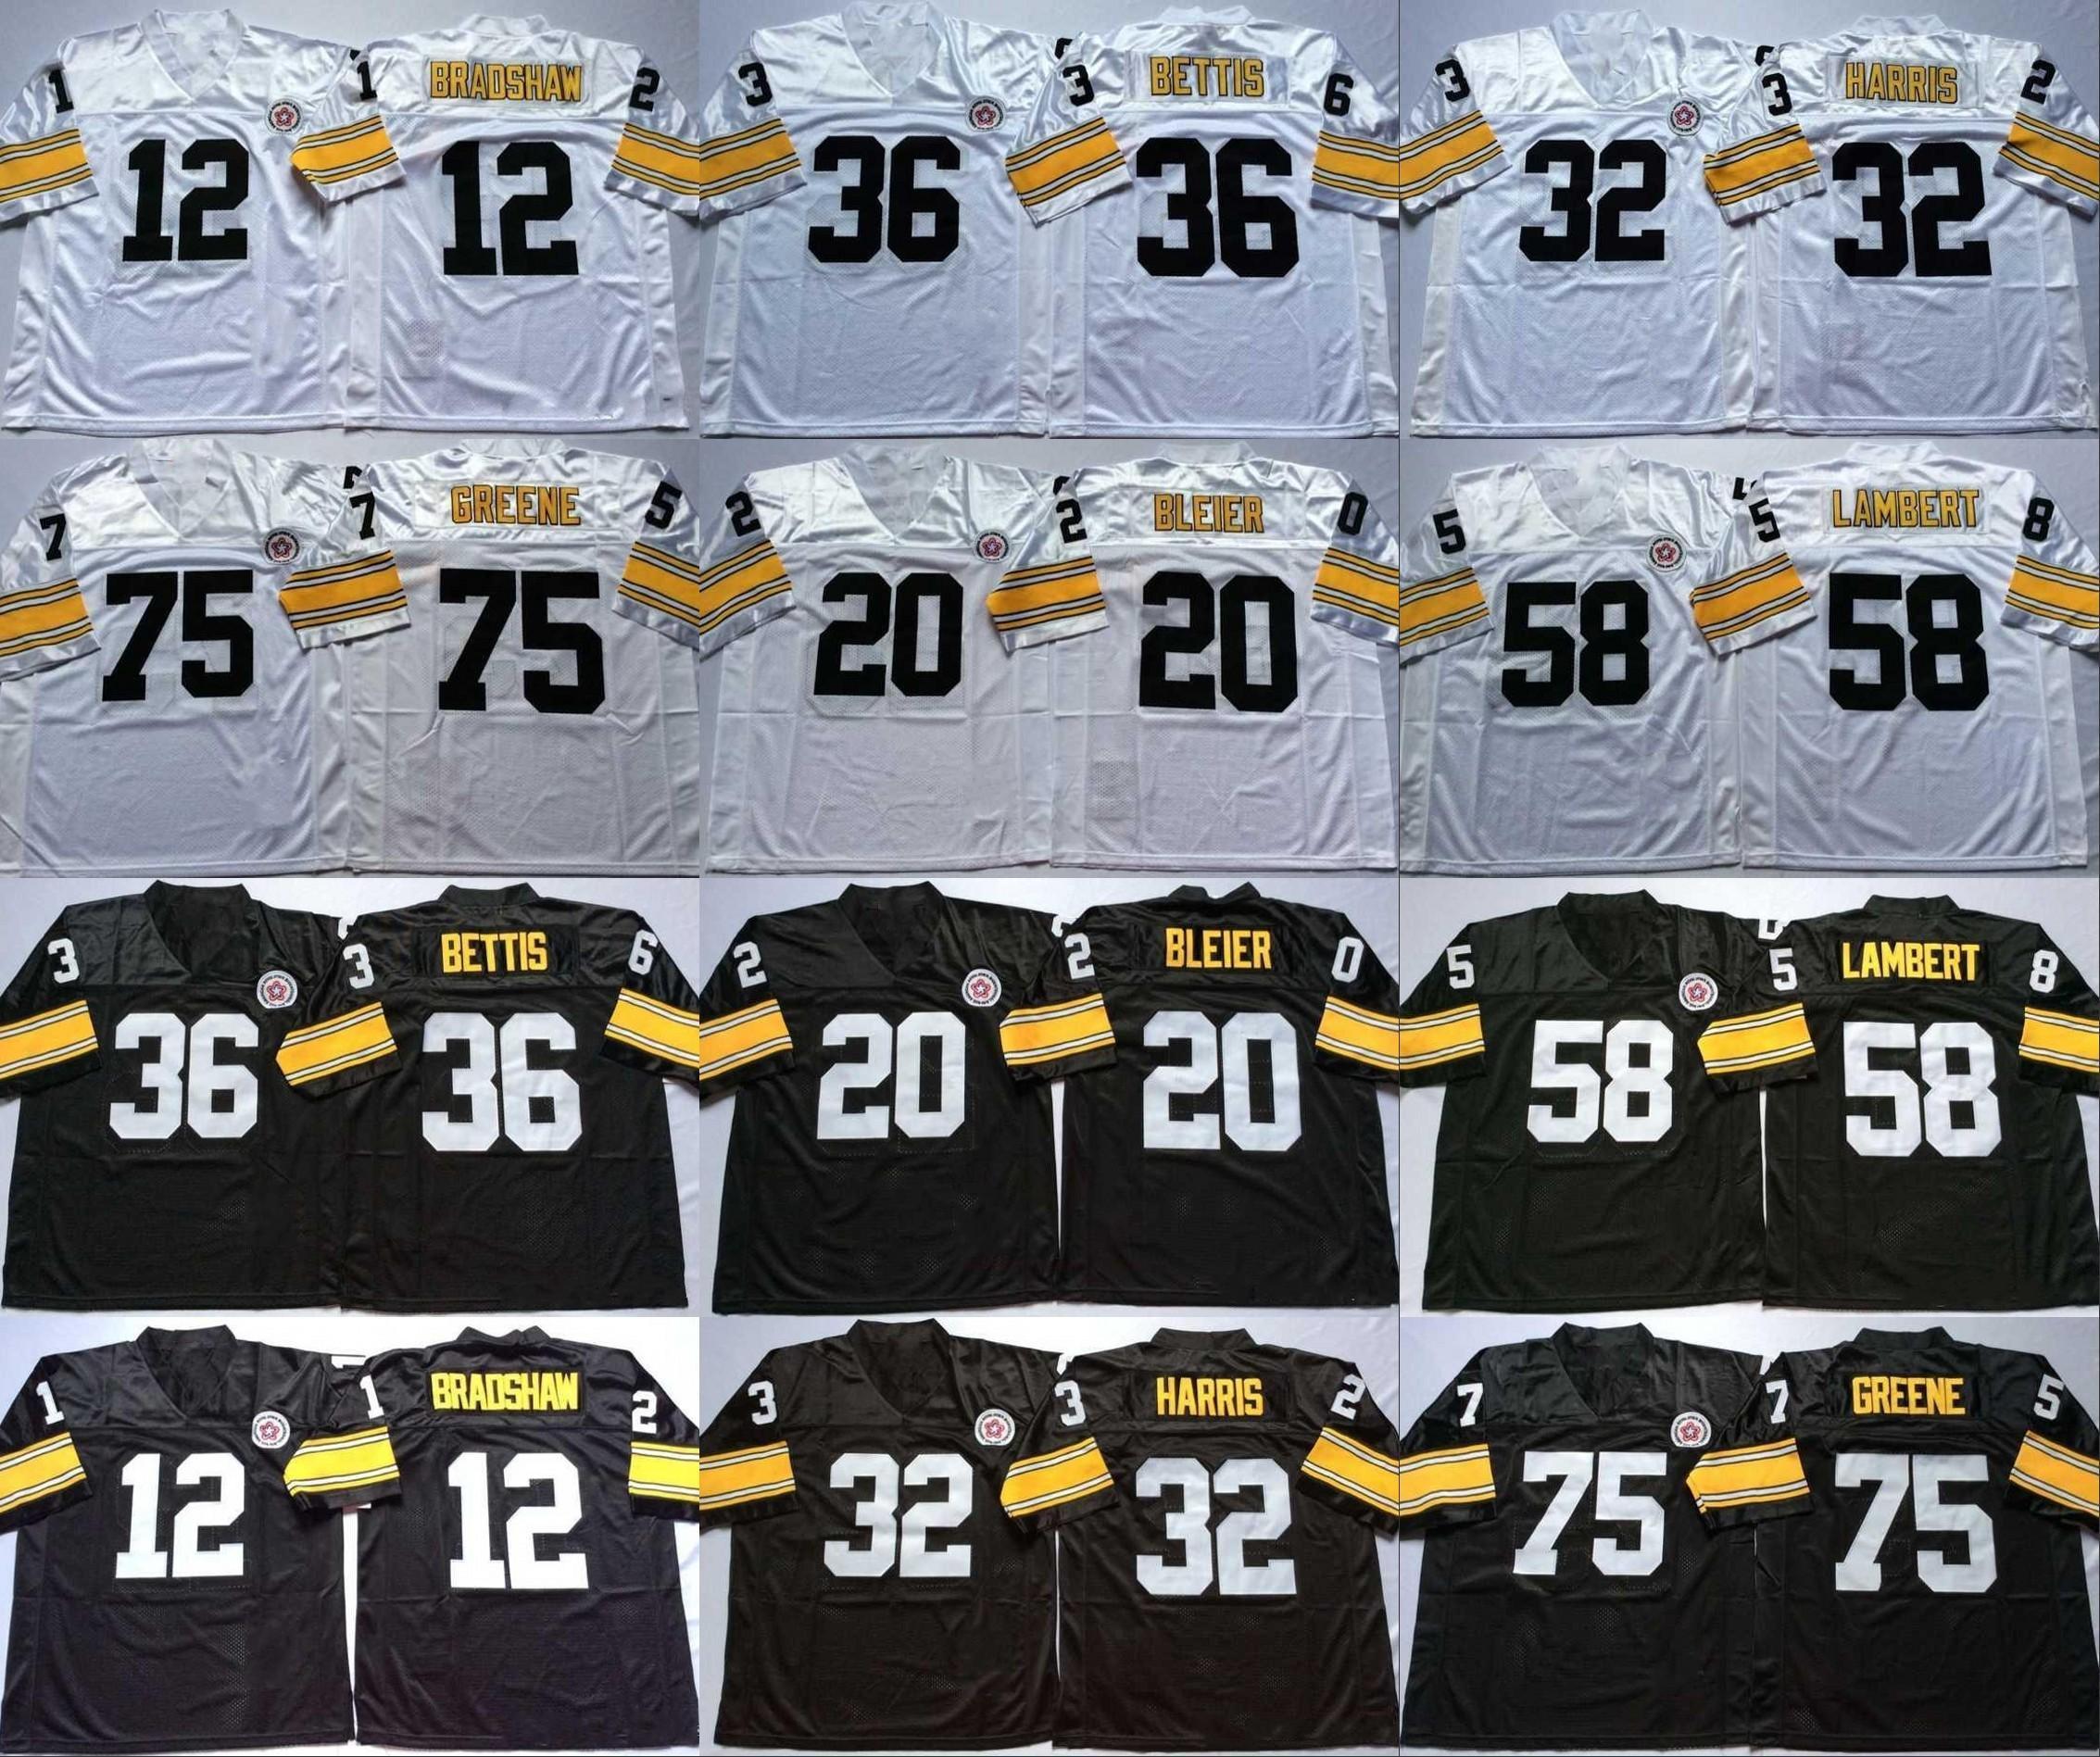 12 Terry Bradshaw 20 Rocky Bleier 32 Franco Harris 36 Jerome Bettis 58 Jack Lambert 75 Joe Greene Blanco Negro Camisetas de visitante